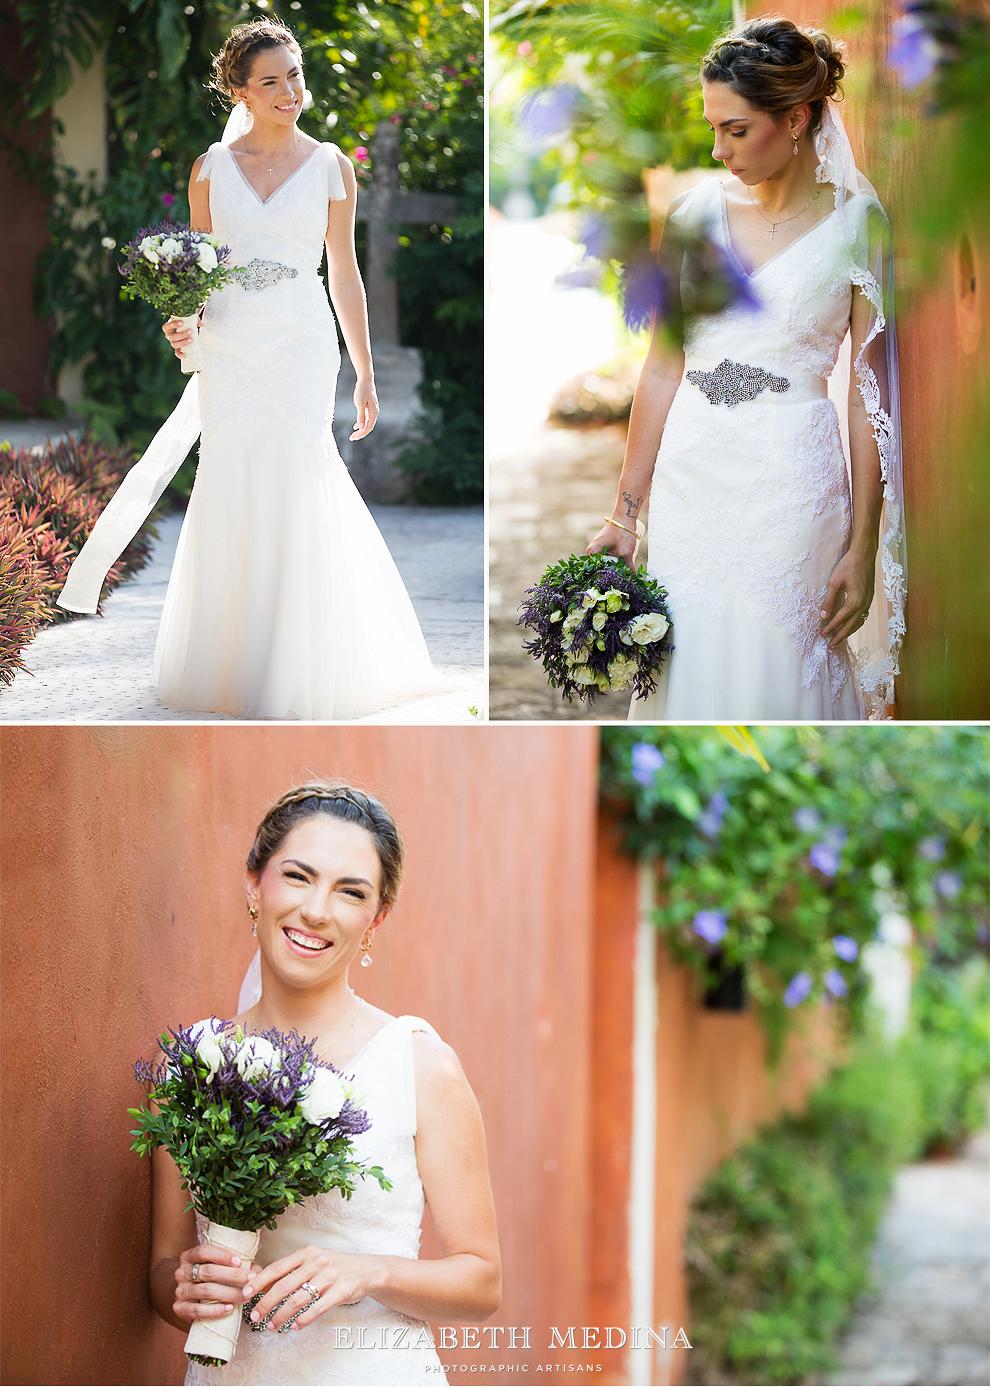 merida_wedding_e001_808_ Merida Wedding Photography, Fotografia de Boda en Merida